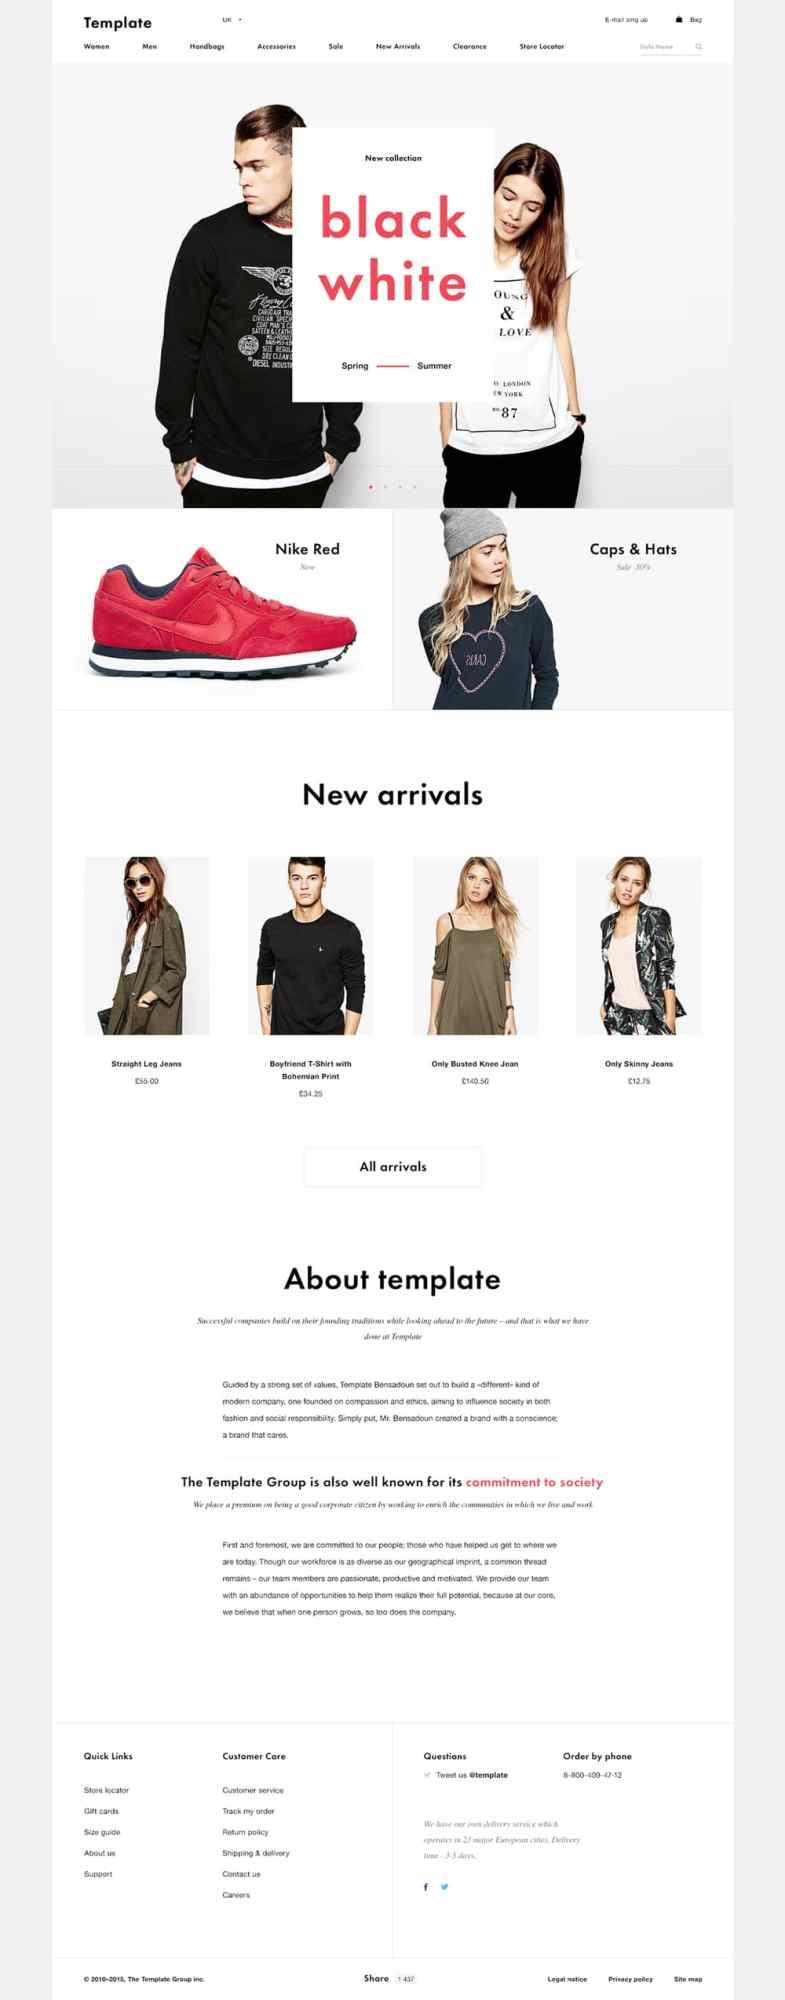 Shop Template free PSD Бесплатные шаблоны для интернет-магазина psd - Shop Template Free PSD - Бесплатные шаблоны для интернет-магазина PSD